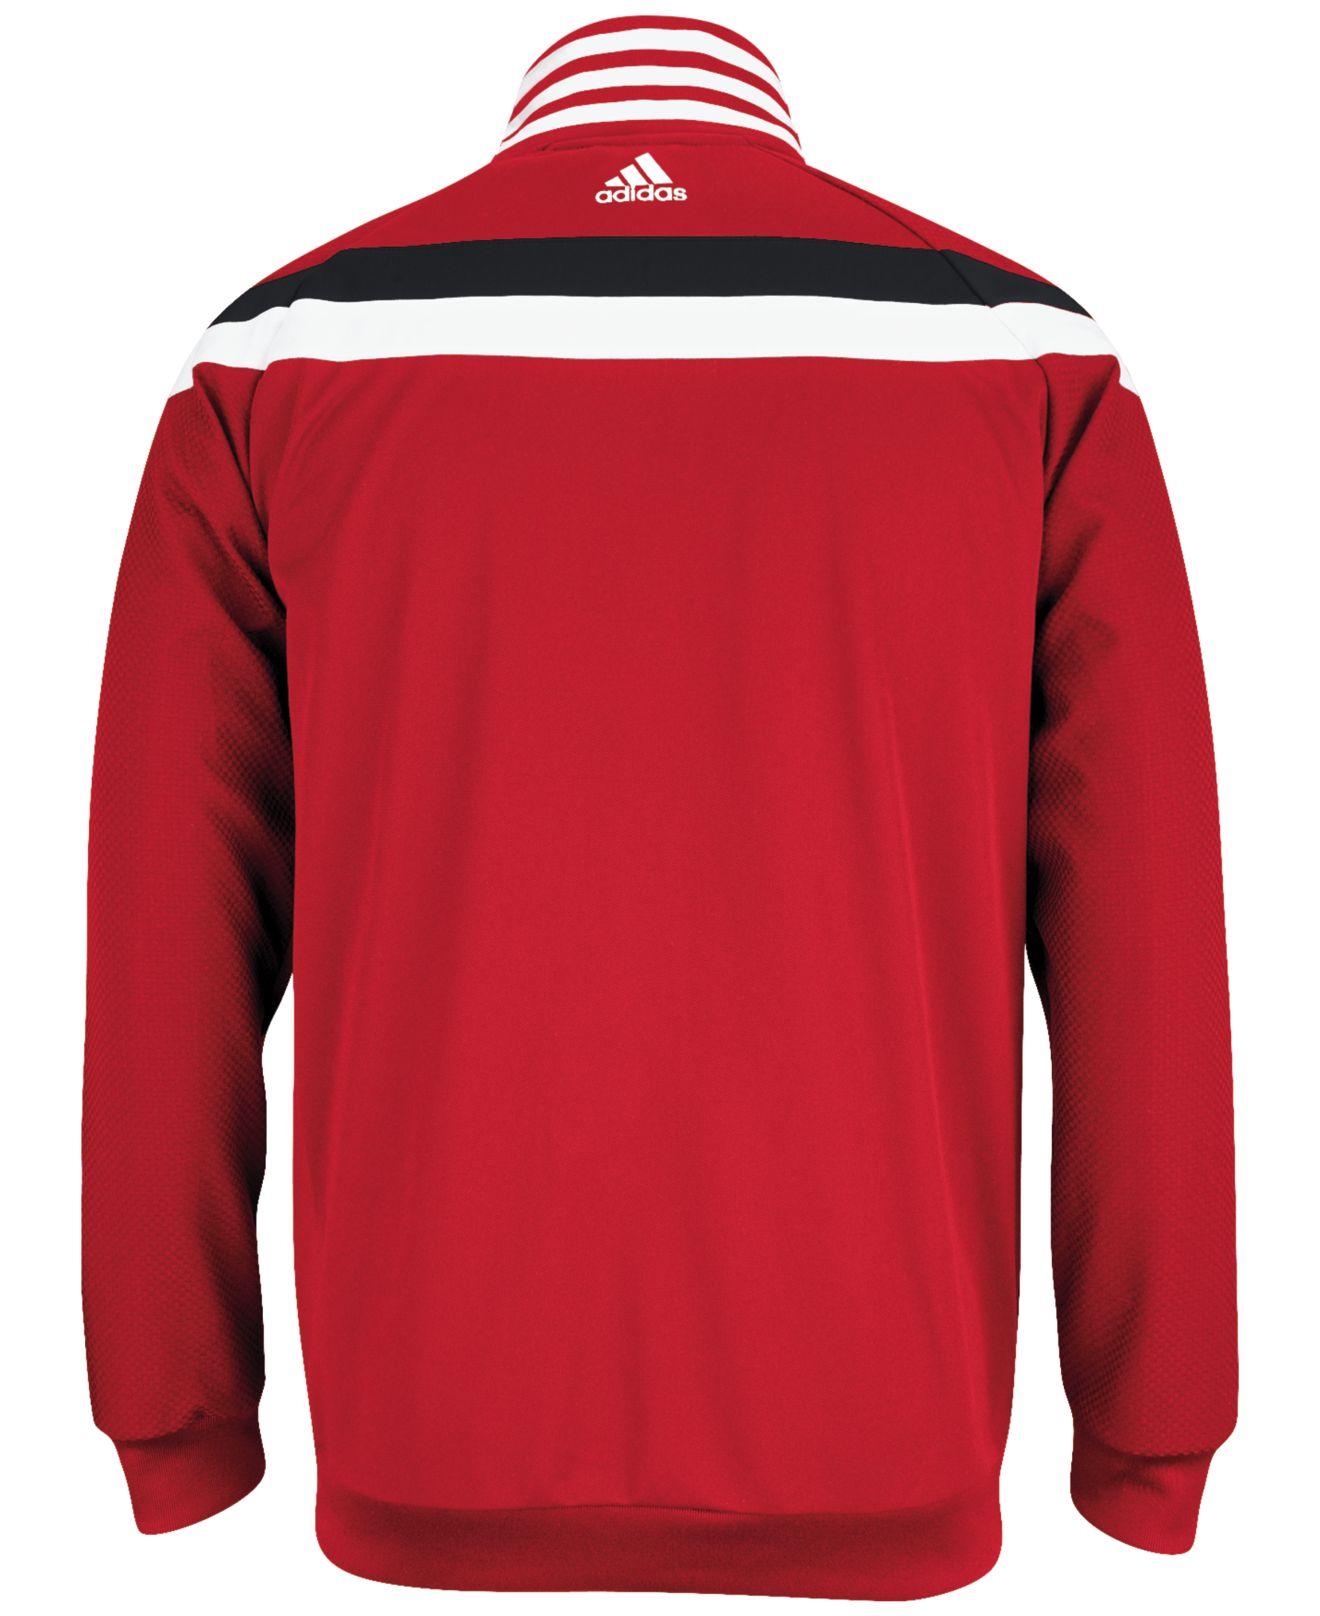 Portland Blkazer: Adidas Men'S Portland Trail Blazers On-Court Jacket In Red